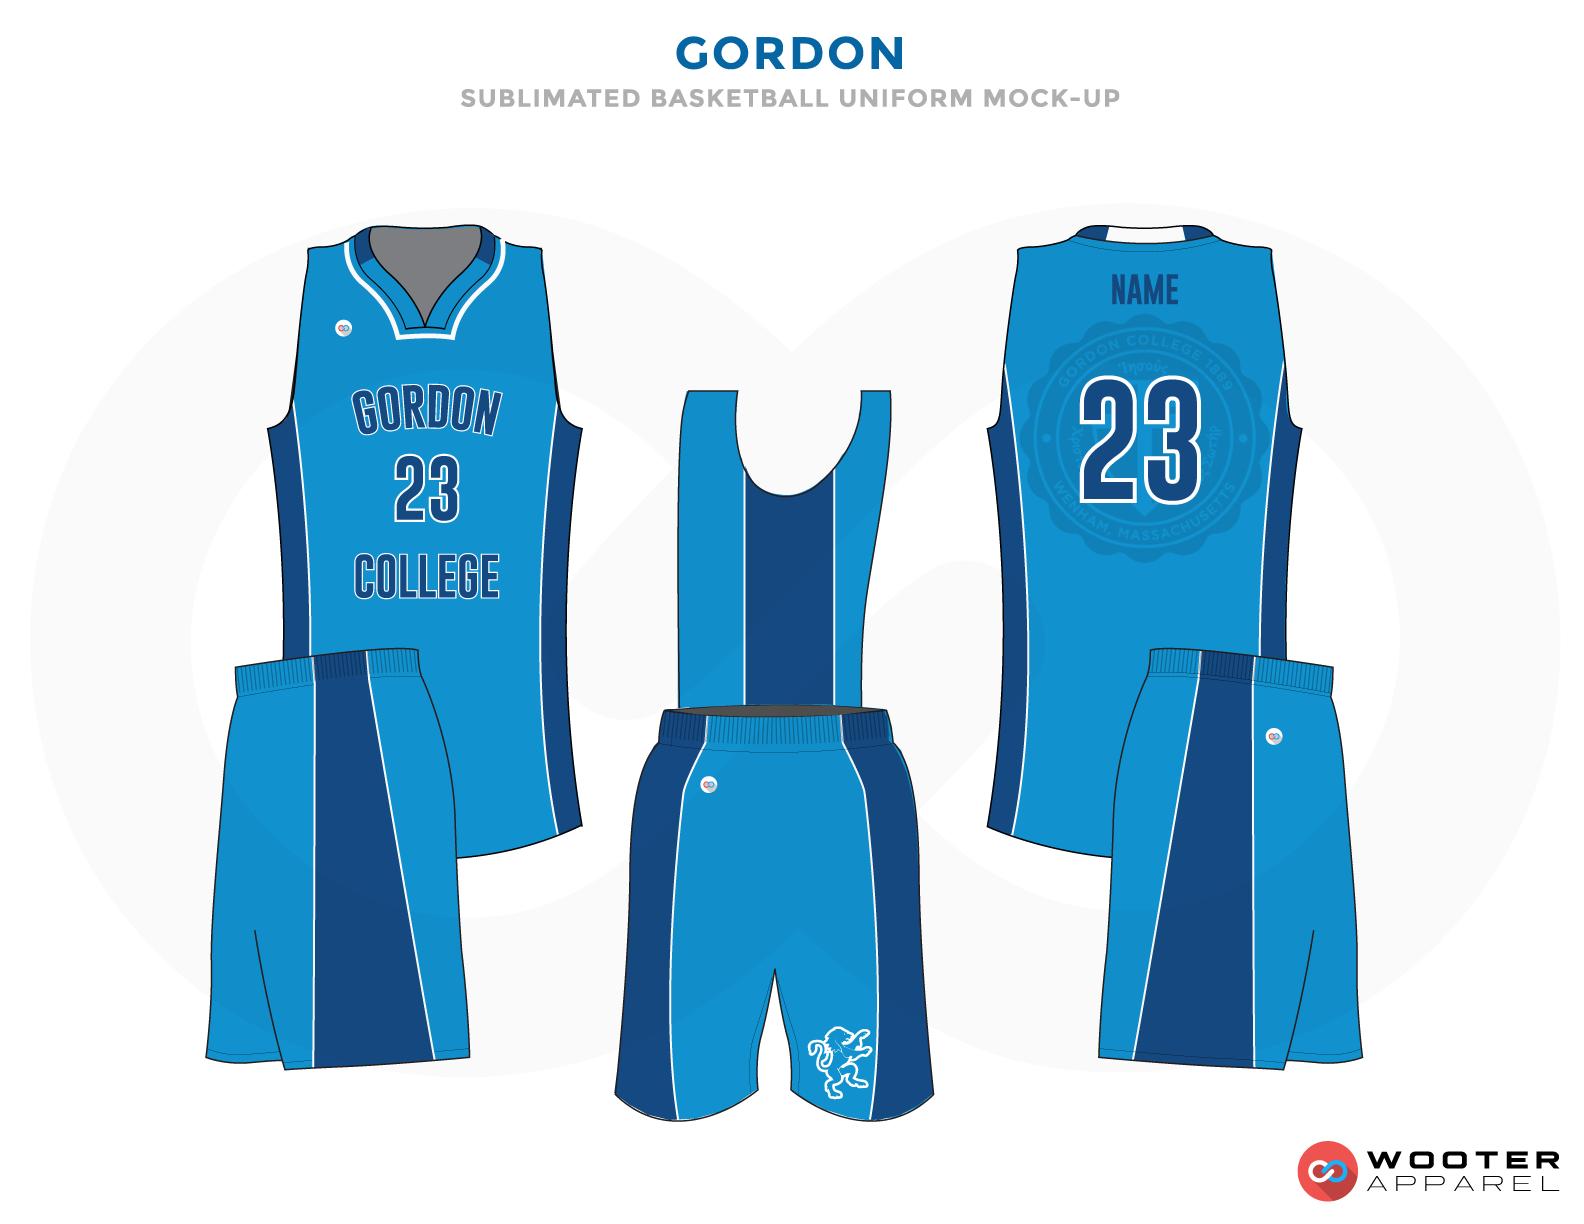 GORDON light blue dark blue white School basketball uniforms jerseys tops shorts